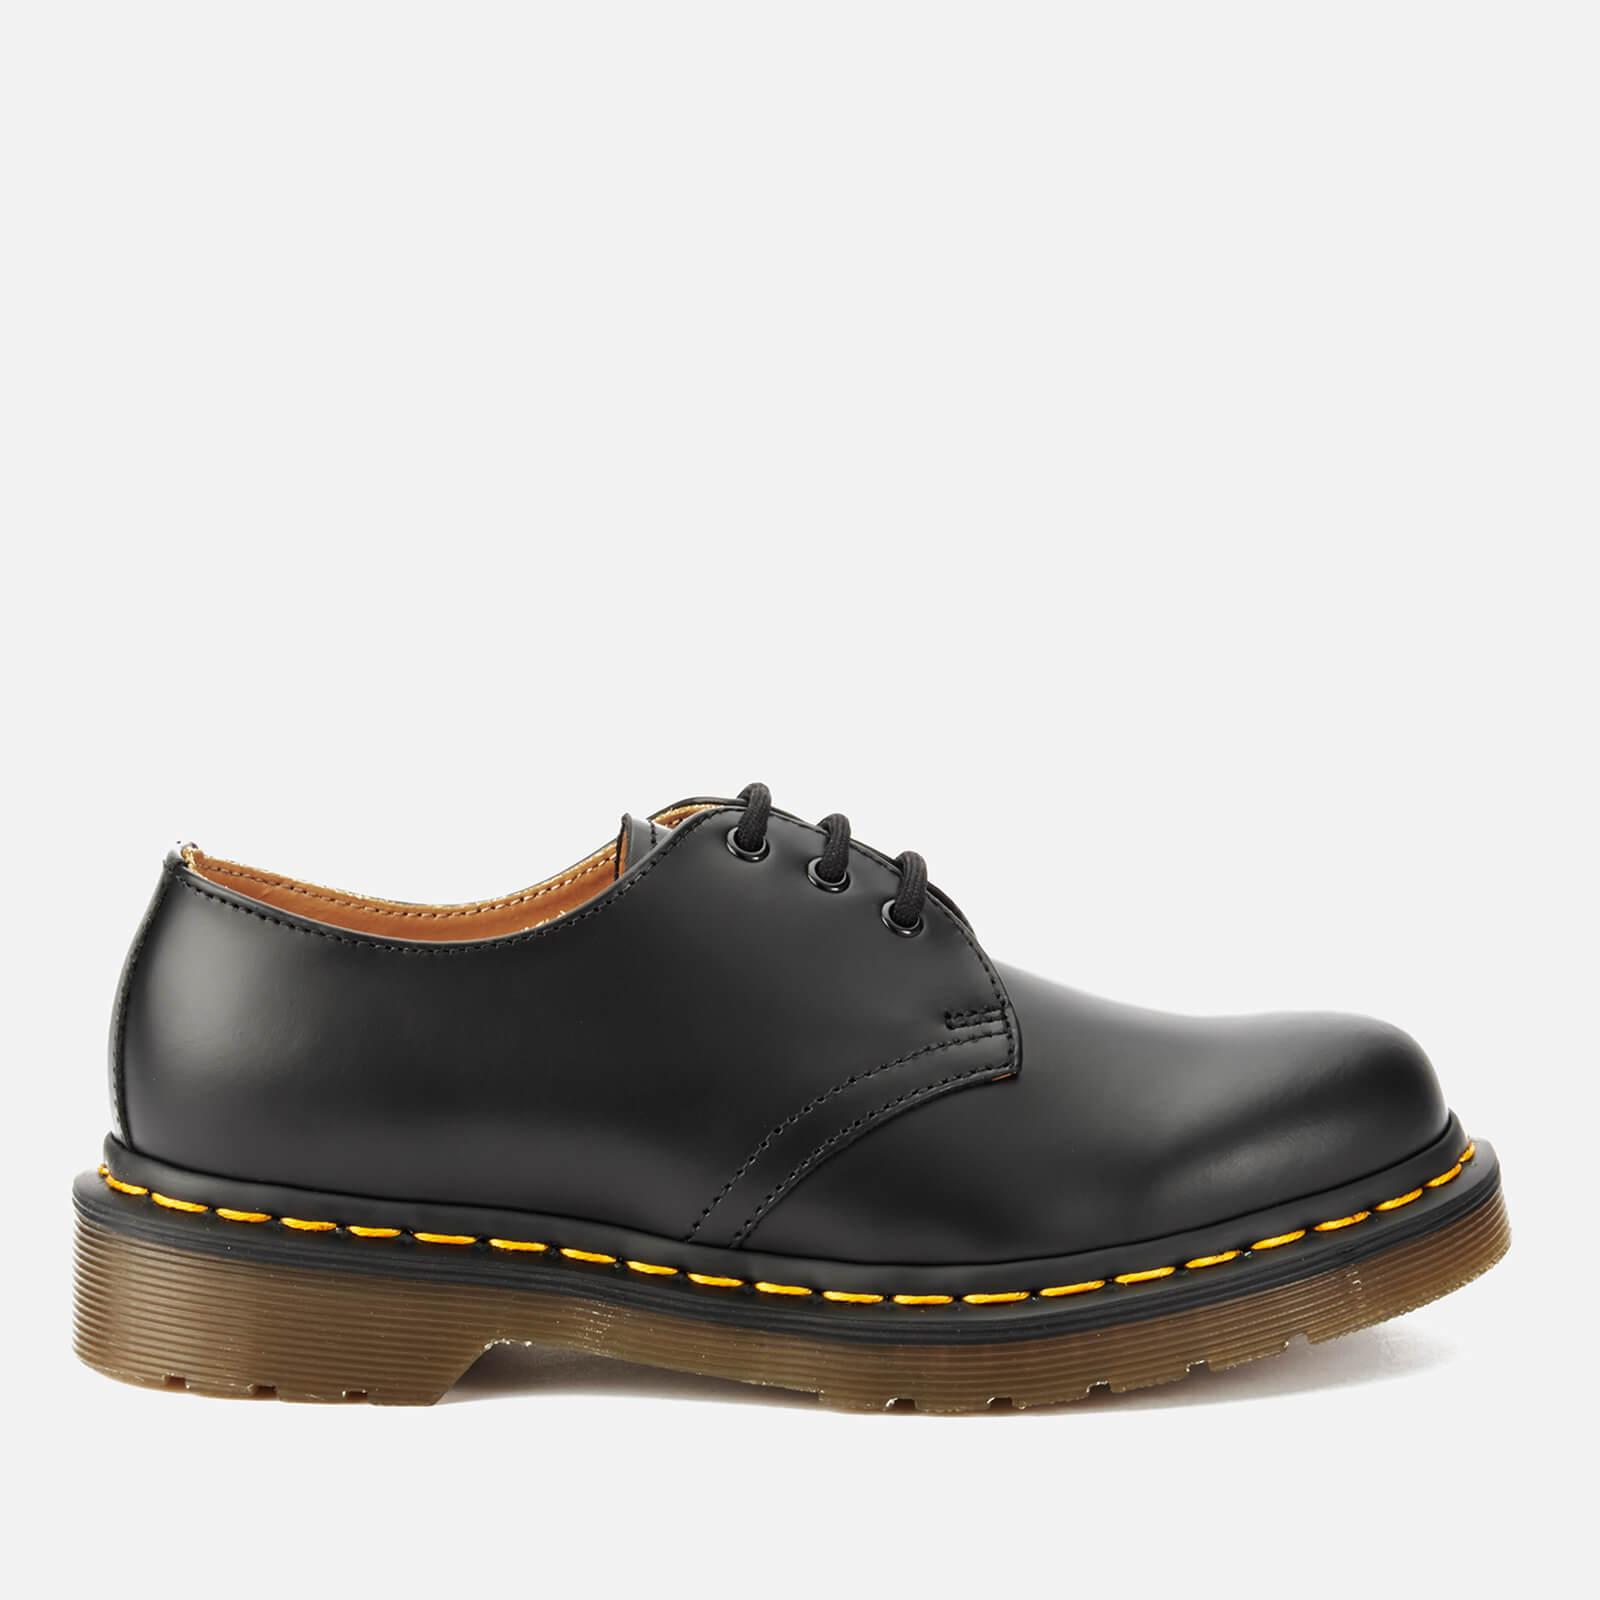 Dr. Martens 1461 Smooth Leather 3-Eye Shoes - Black - UK 11